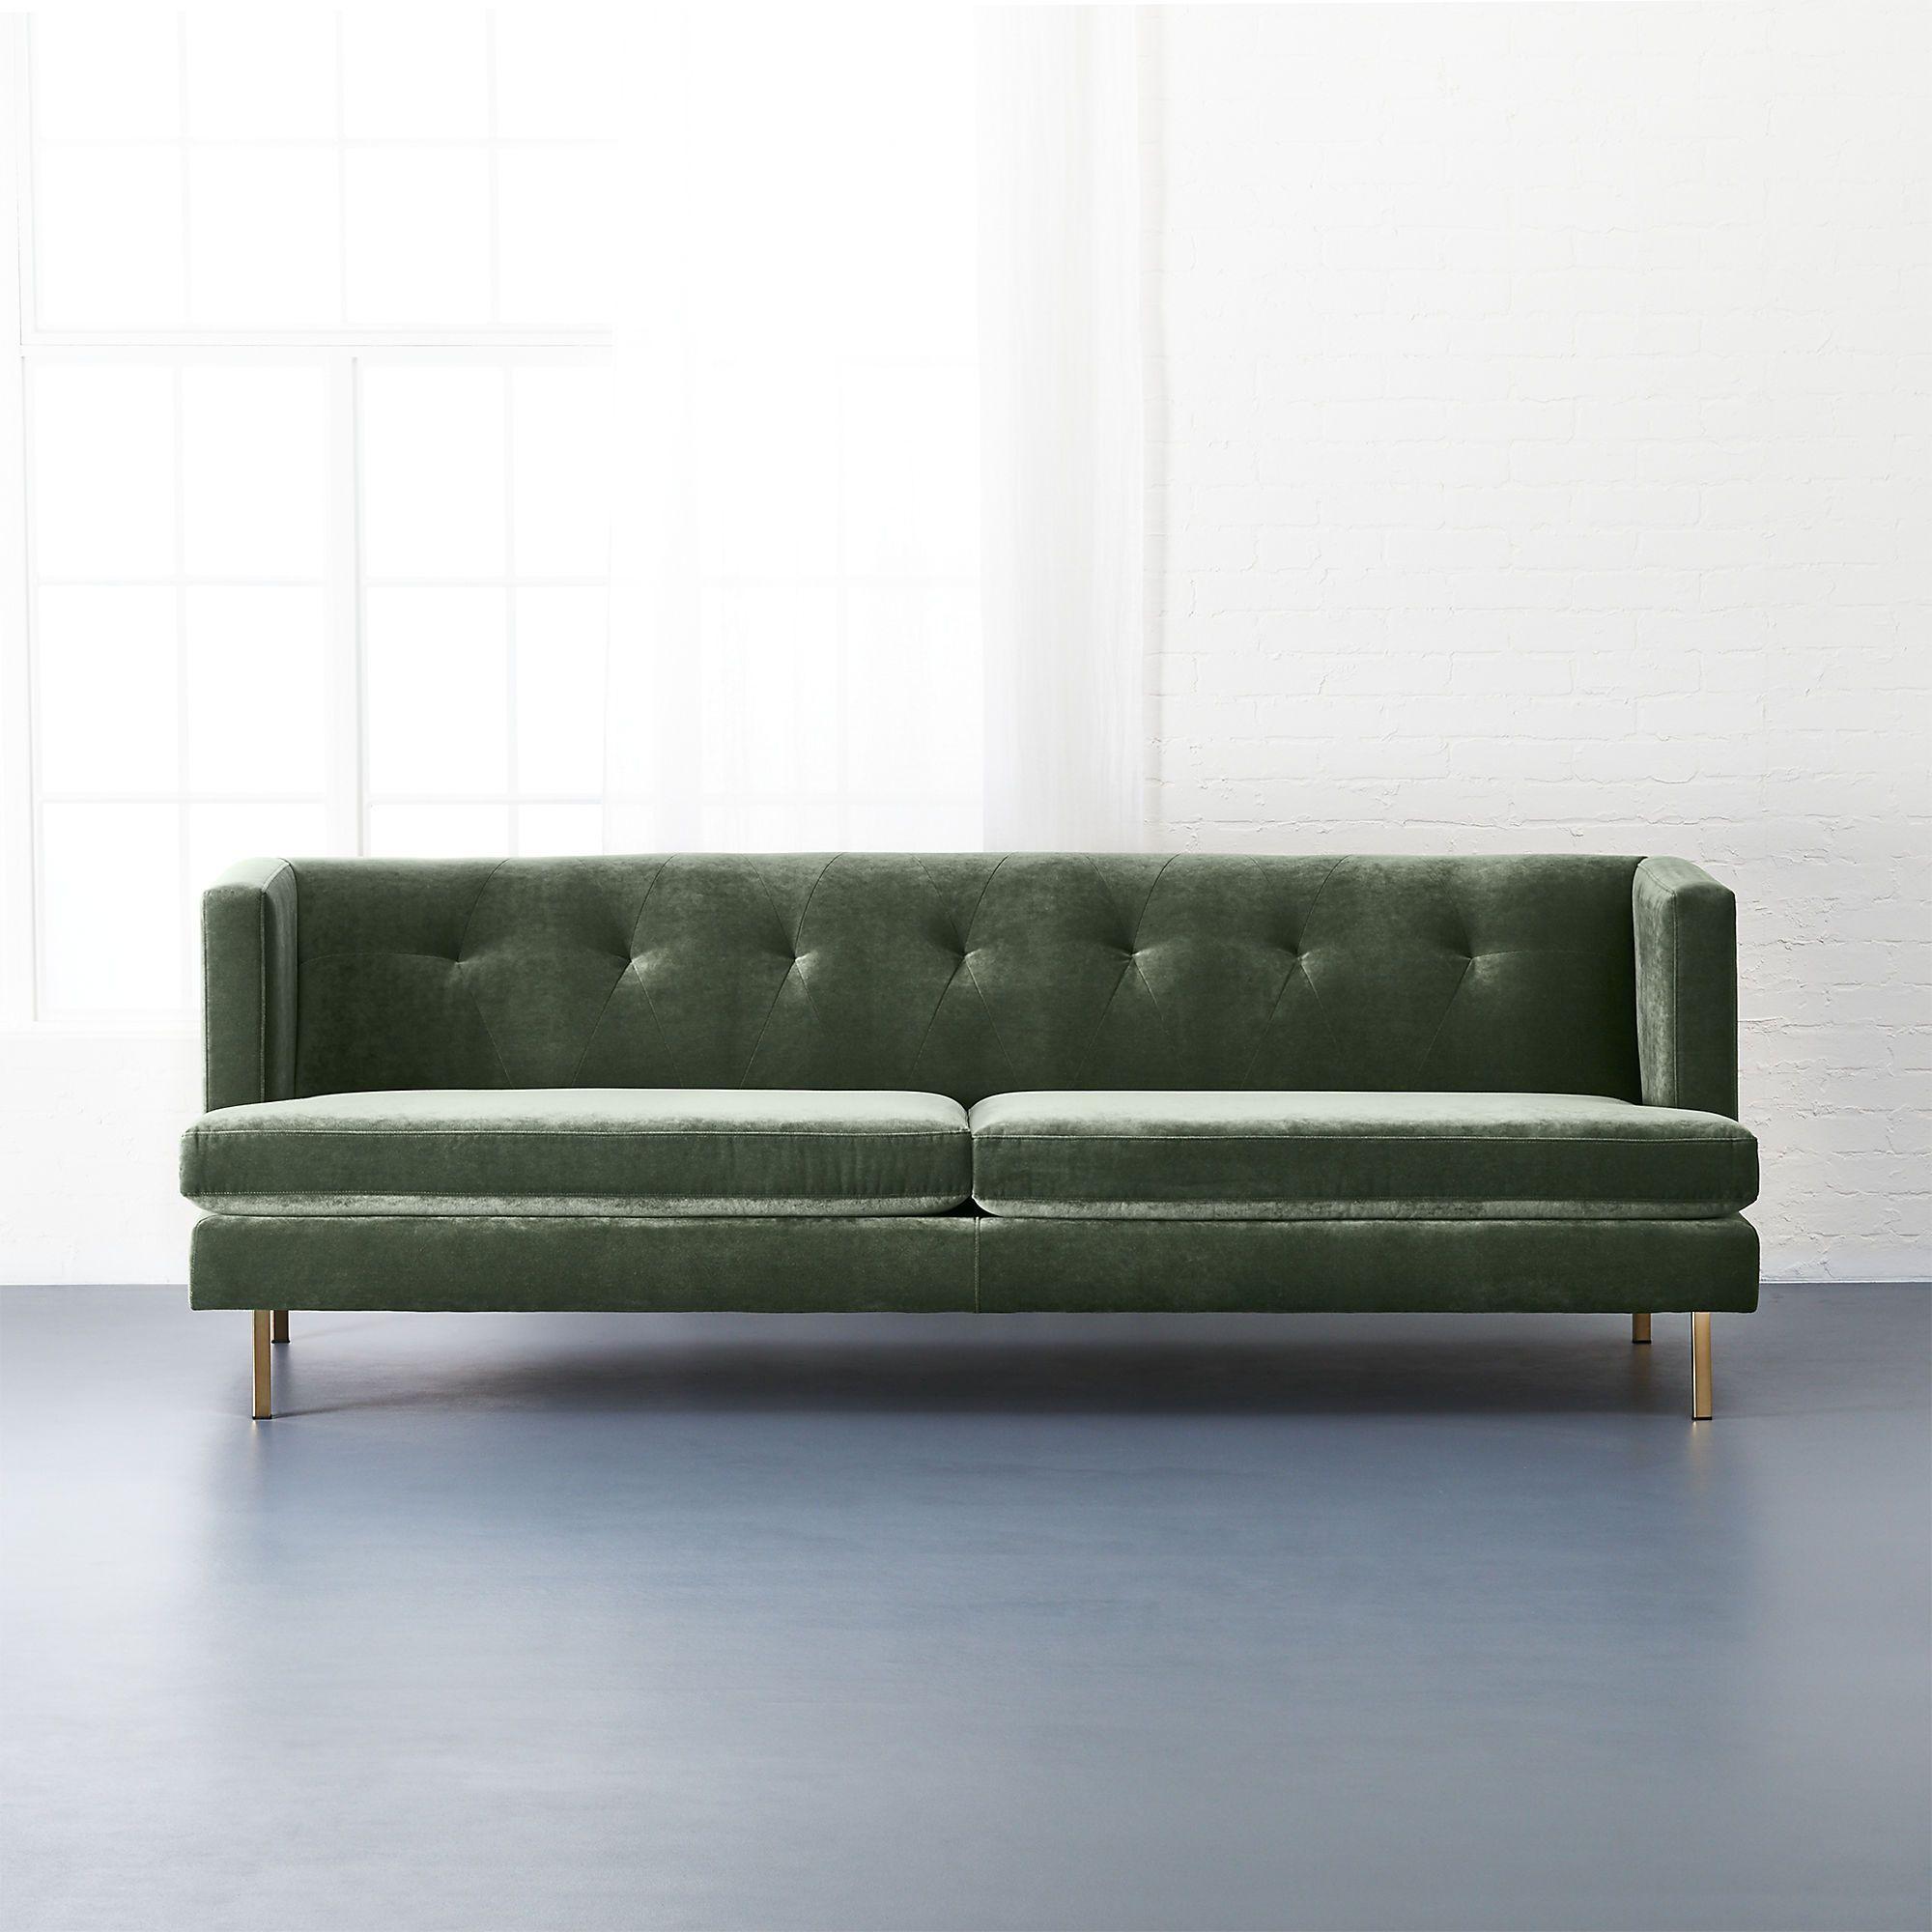 Astonishing Avec Sofa With Brass Legs Cb2 Client S Office Modern Creativecarmelina Interior Chair Design Creativecarmelinacom